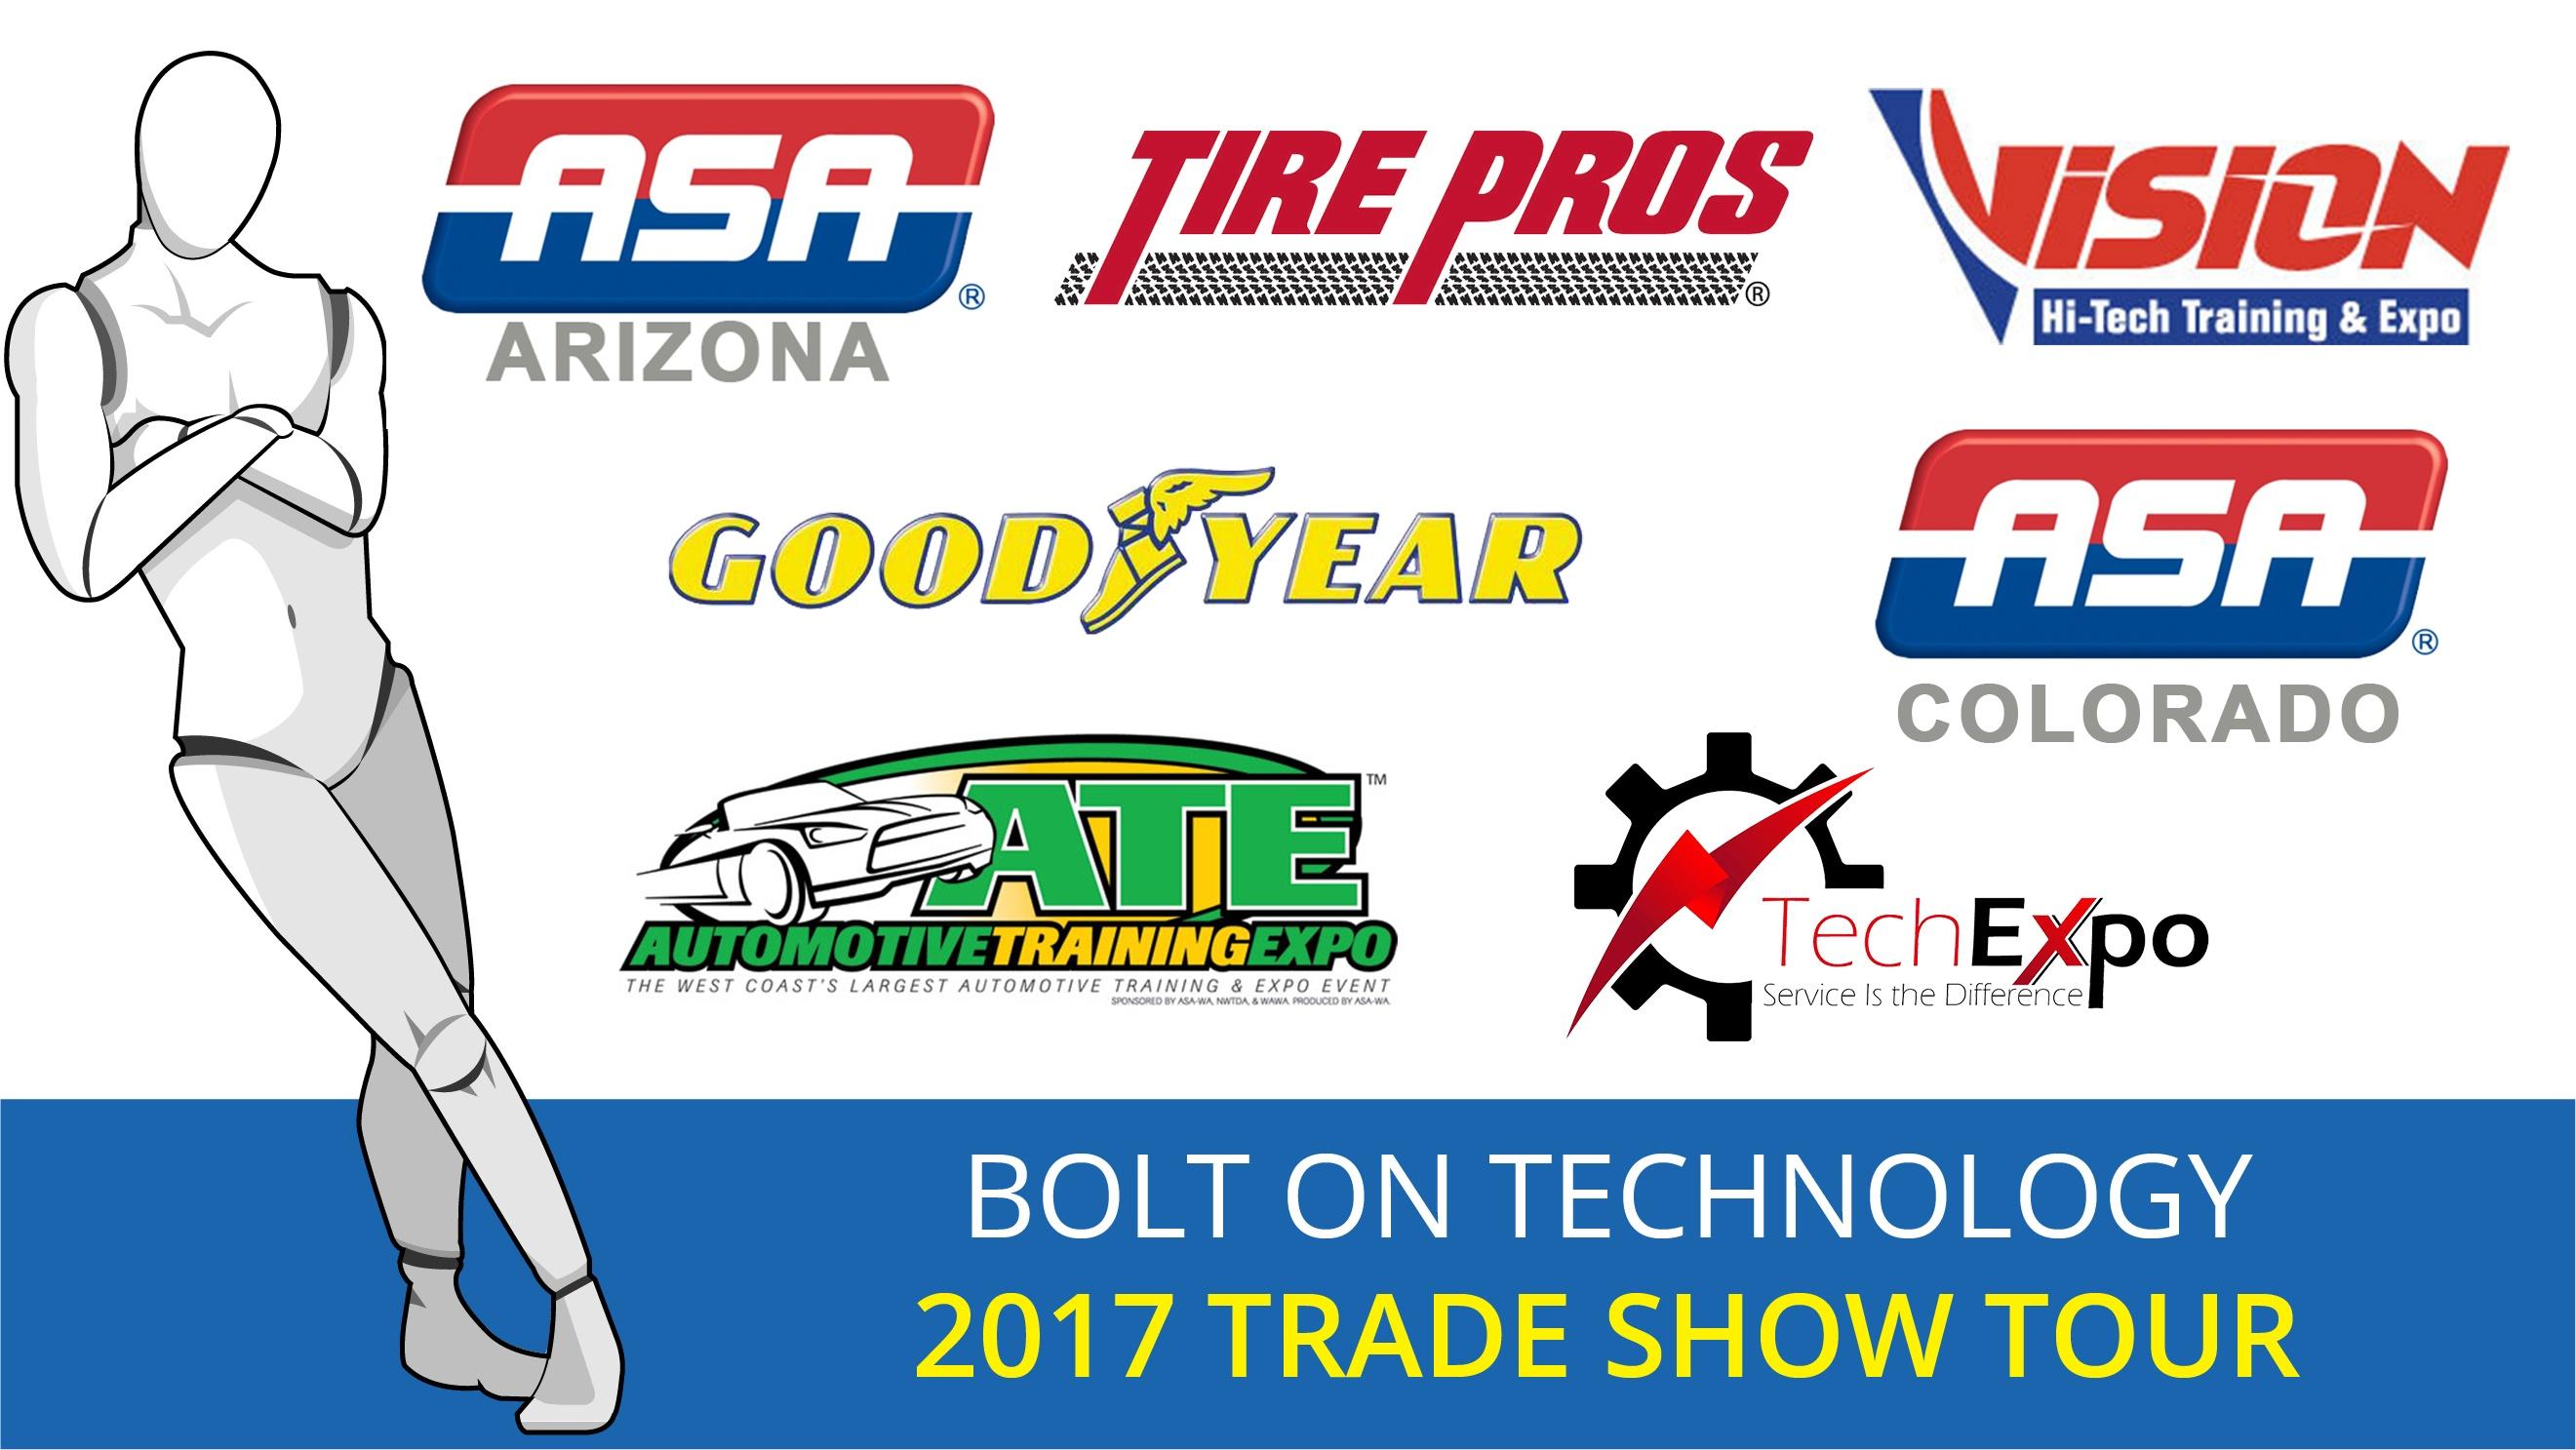 2017 Trade Show Schedule